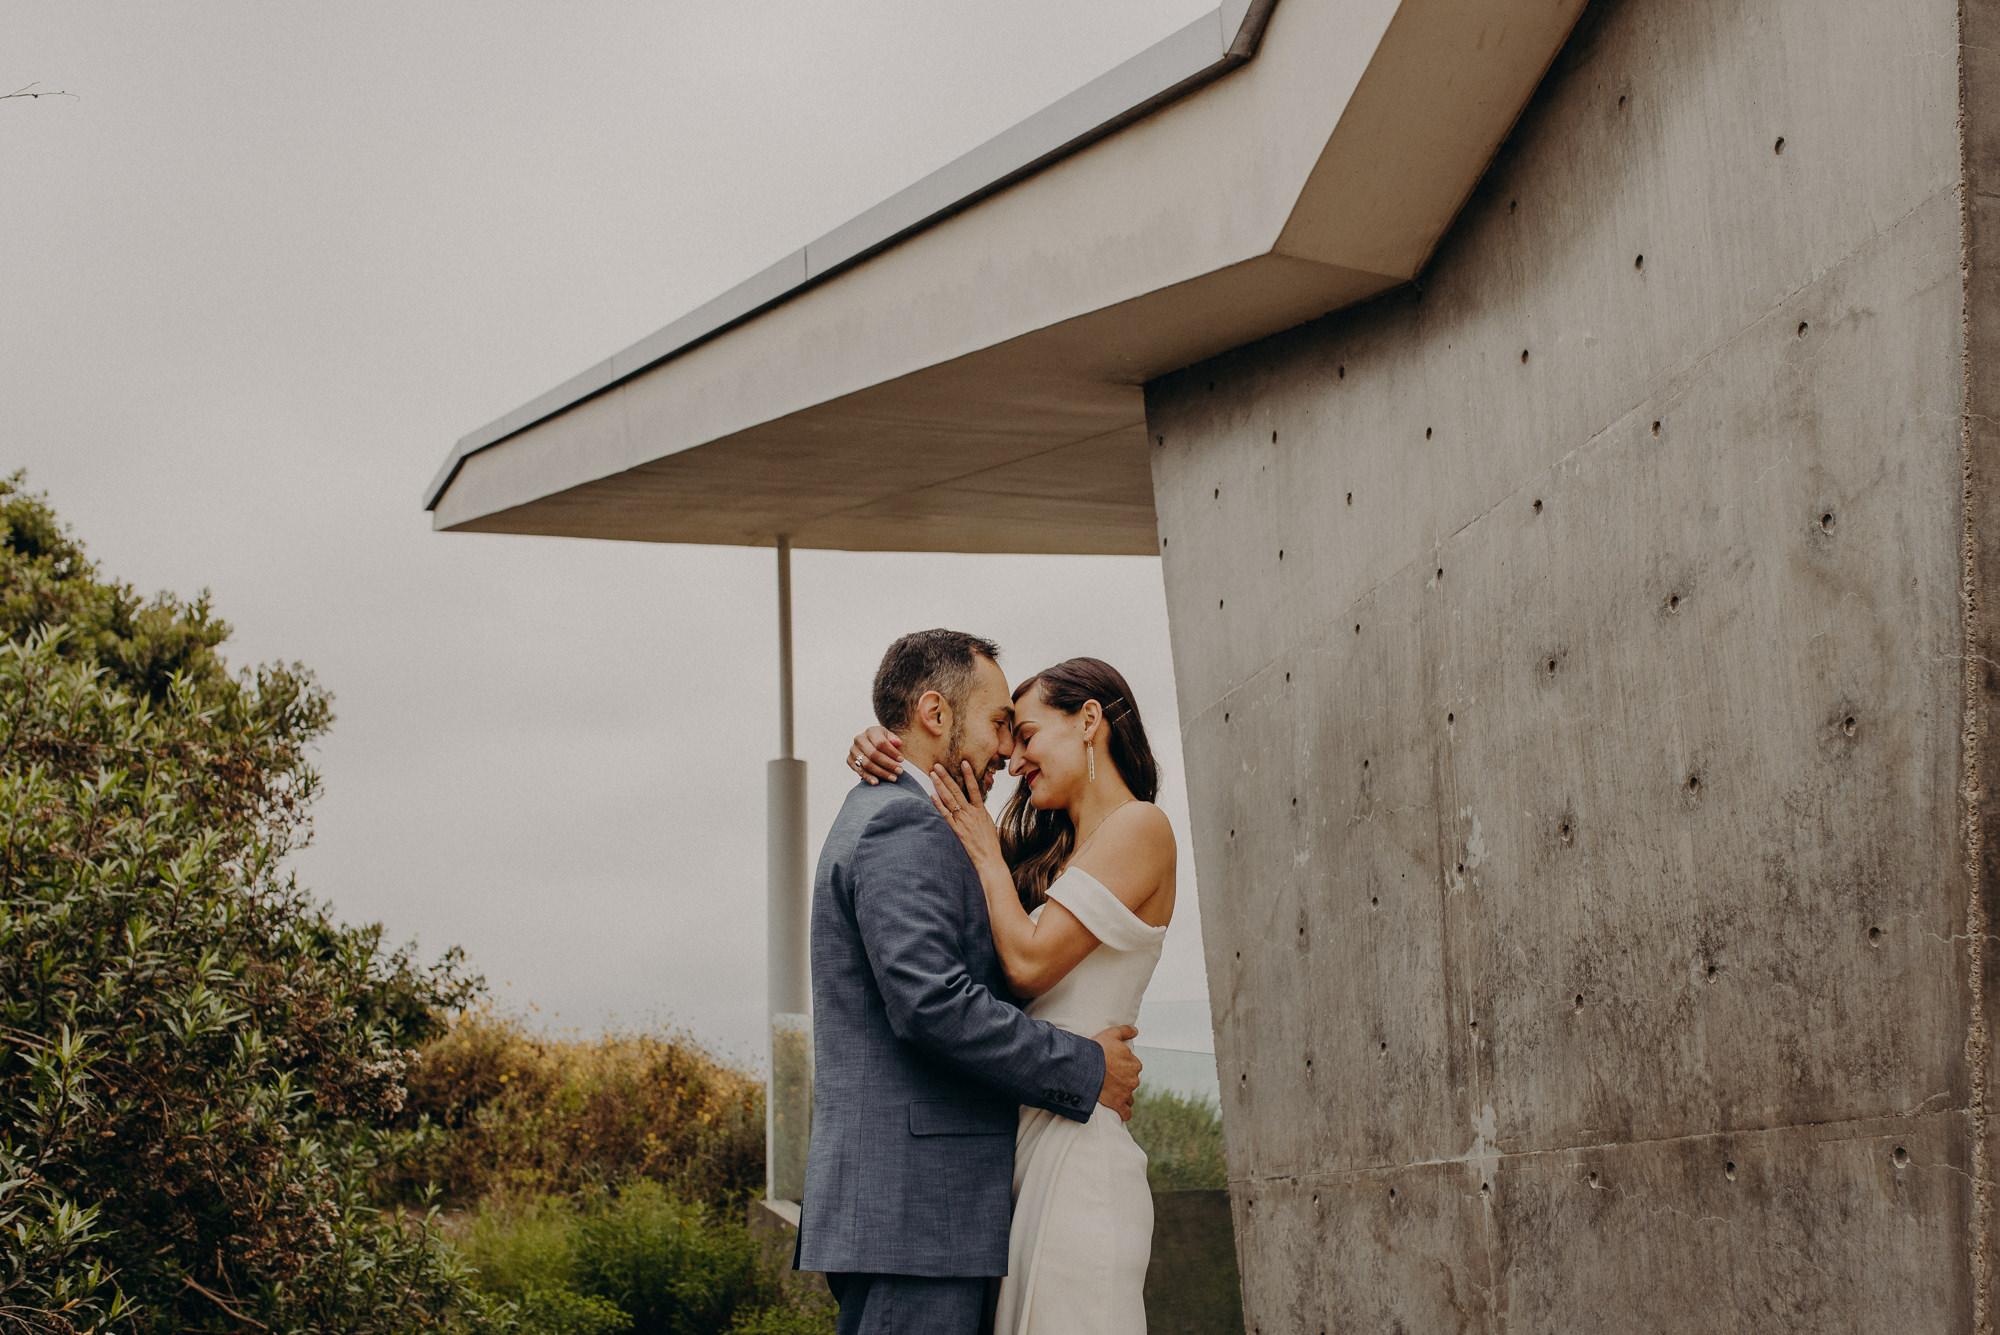 elopement photographer in los angeles - la wedding photographer - isaiahandtaylor.com-044.jpg